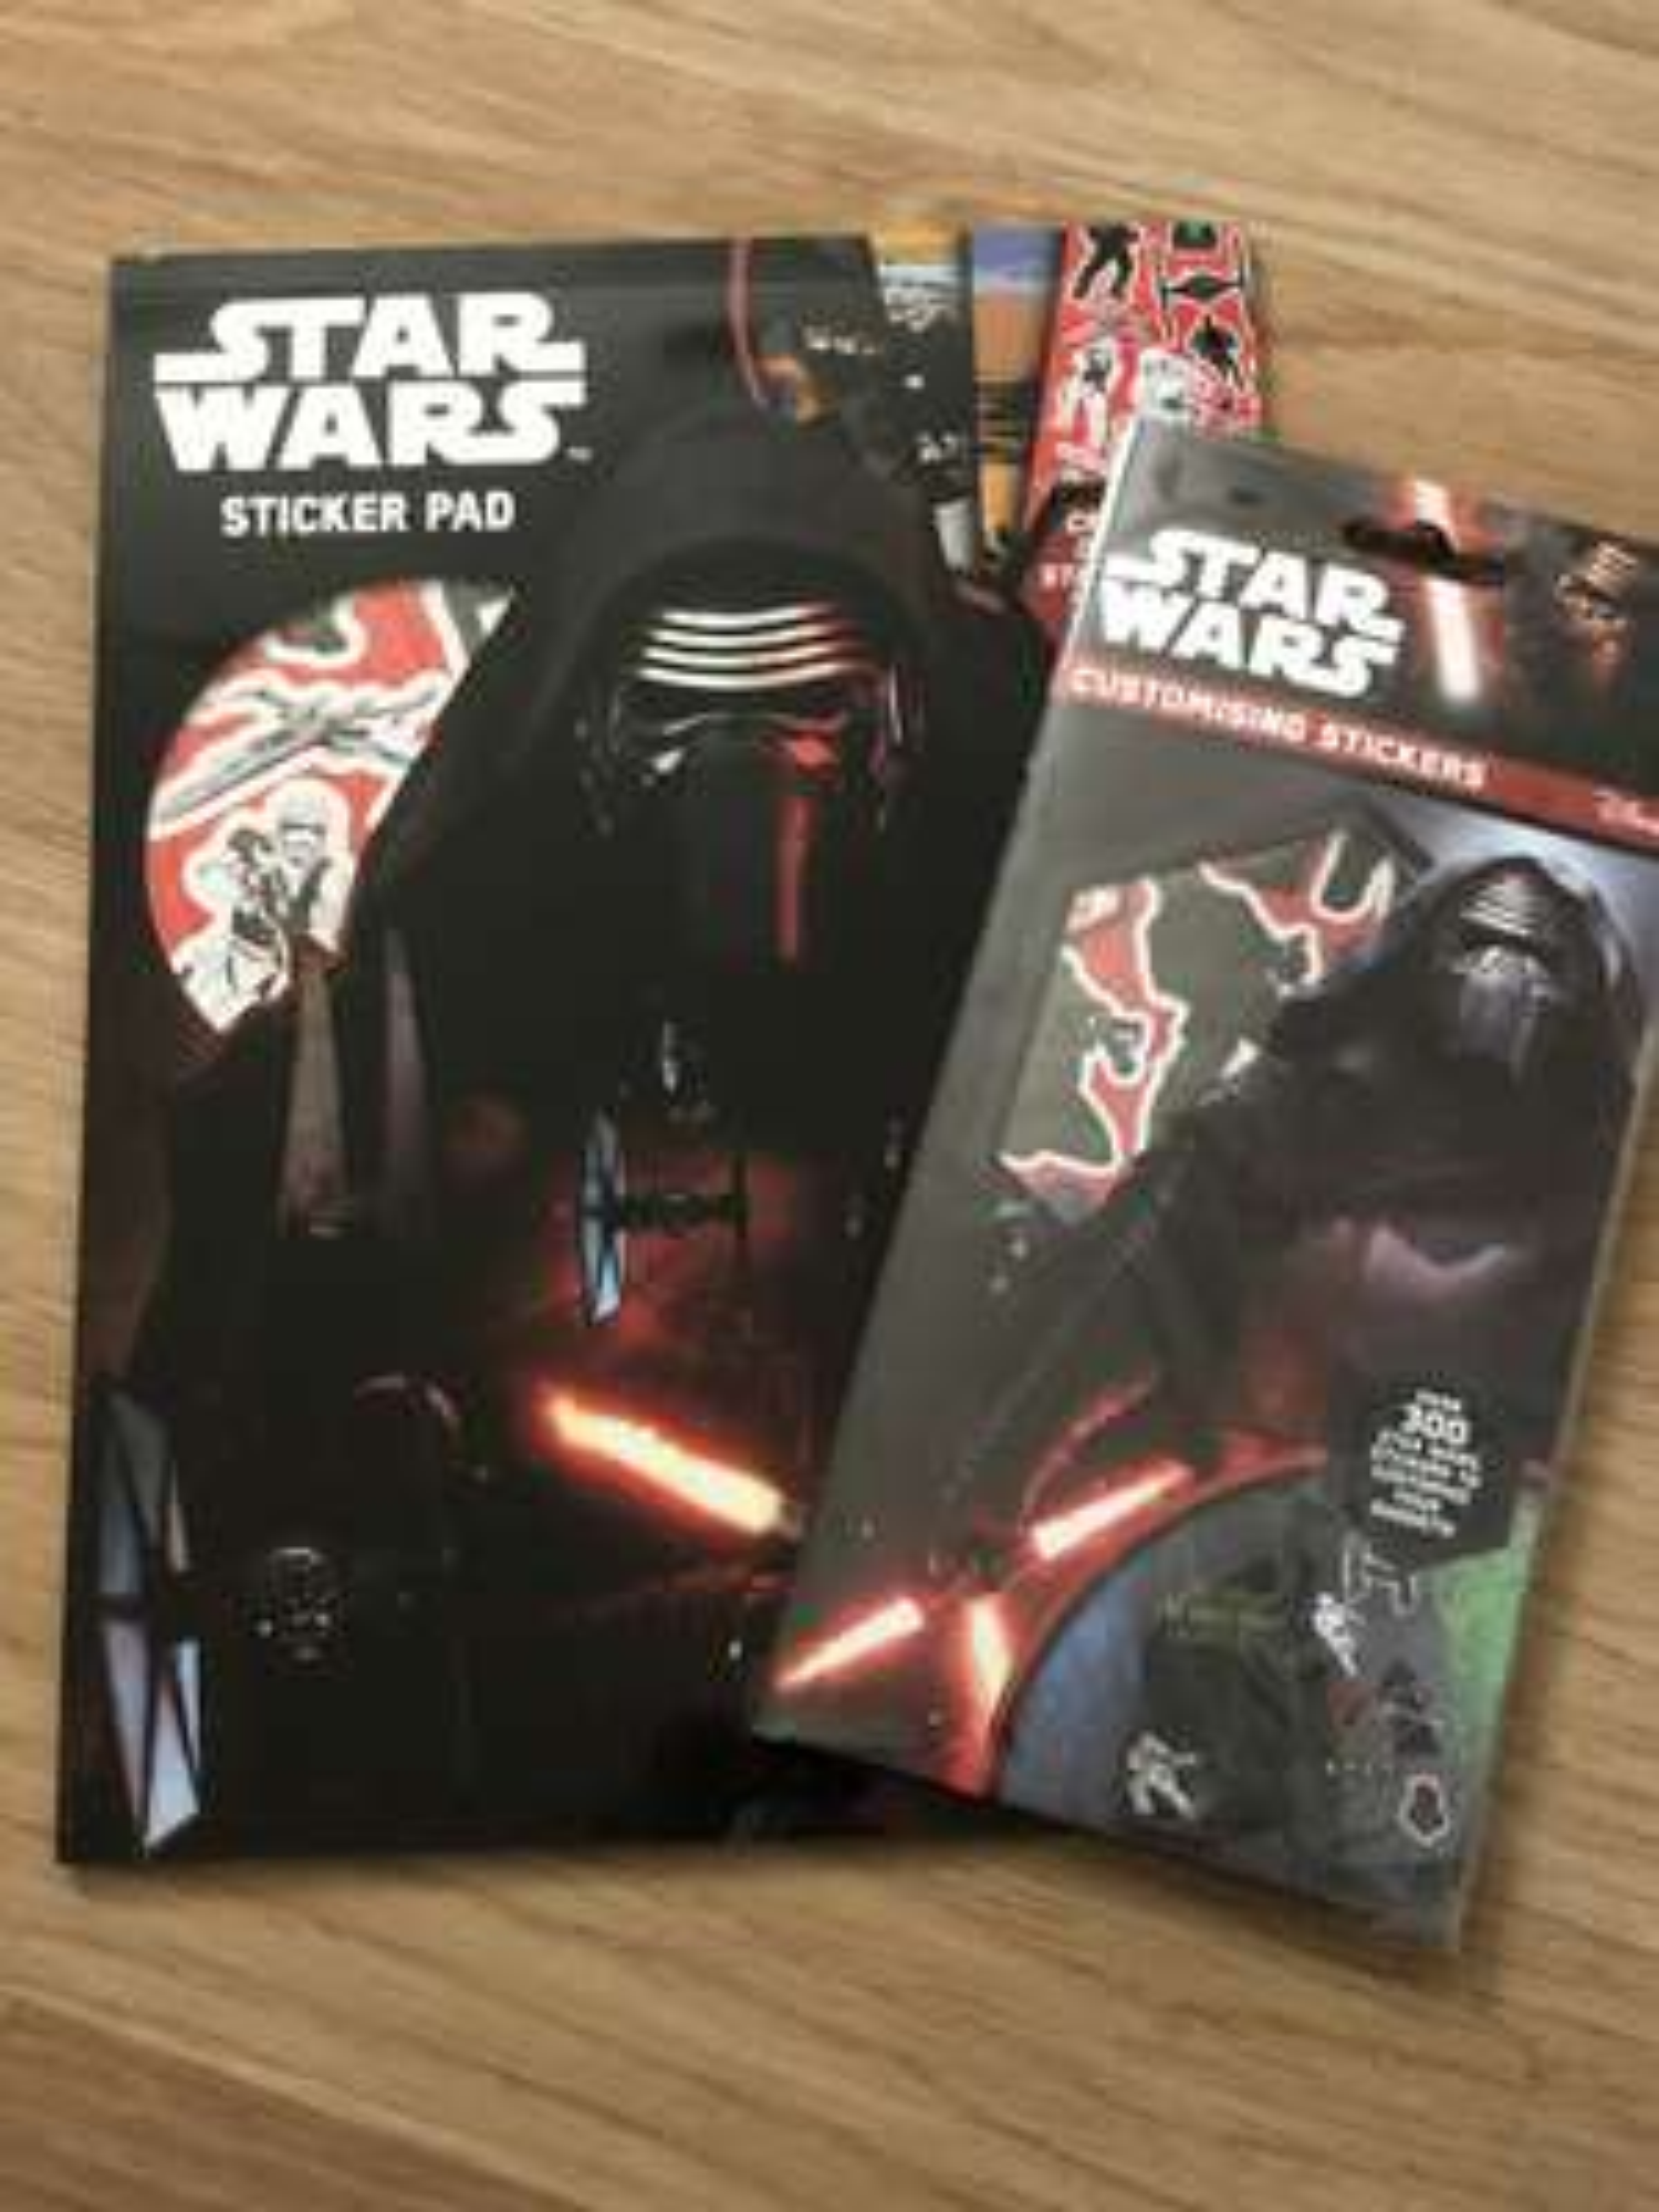 Star Wars 300 pack stickers/ sticker pad 25p each @ Poundstretcher Kent